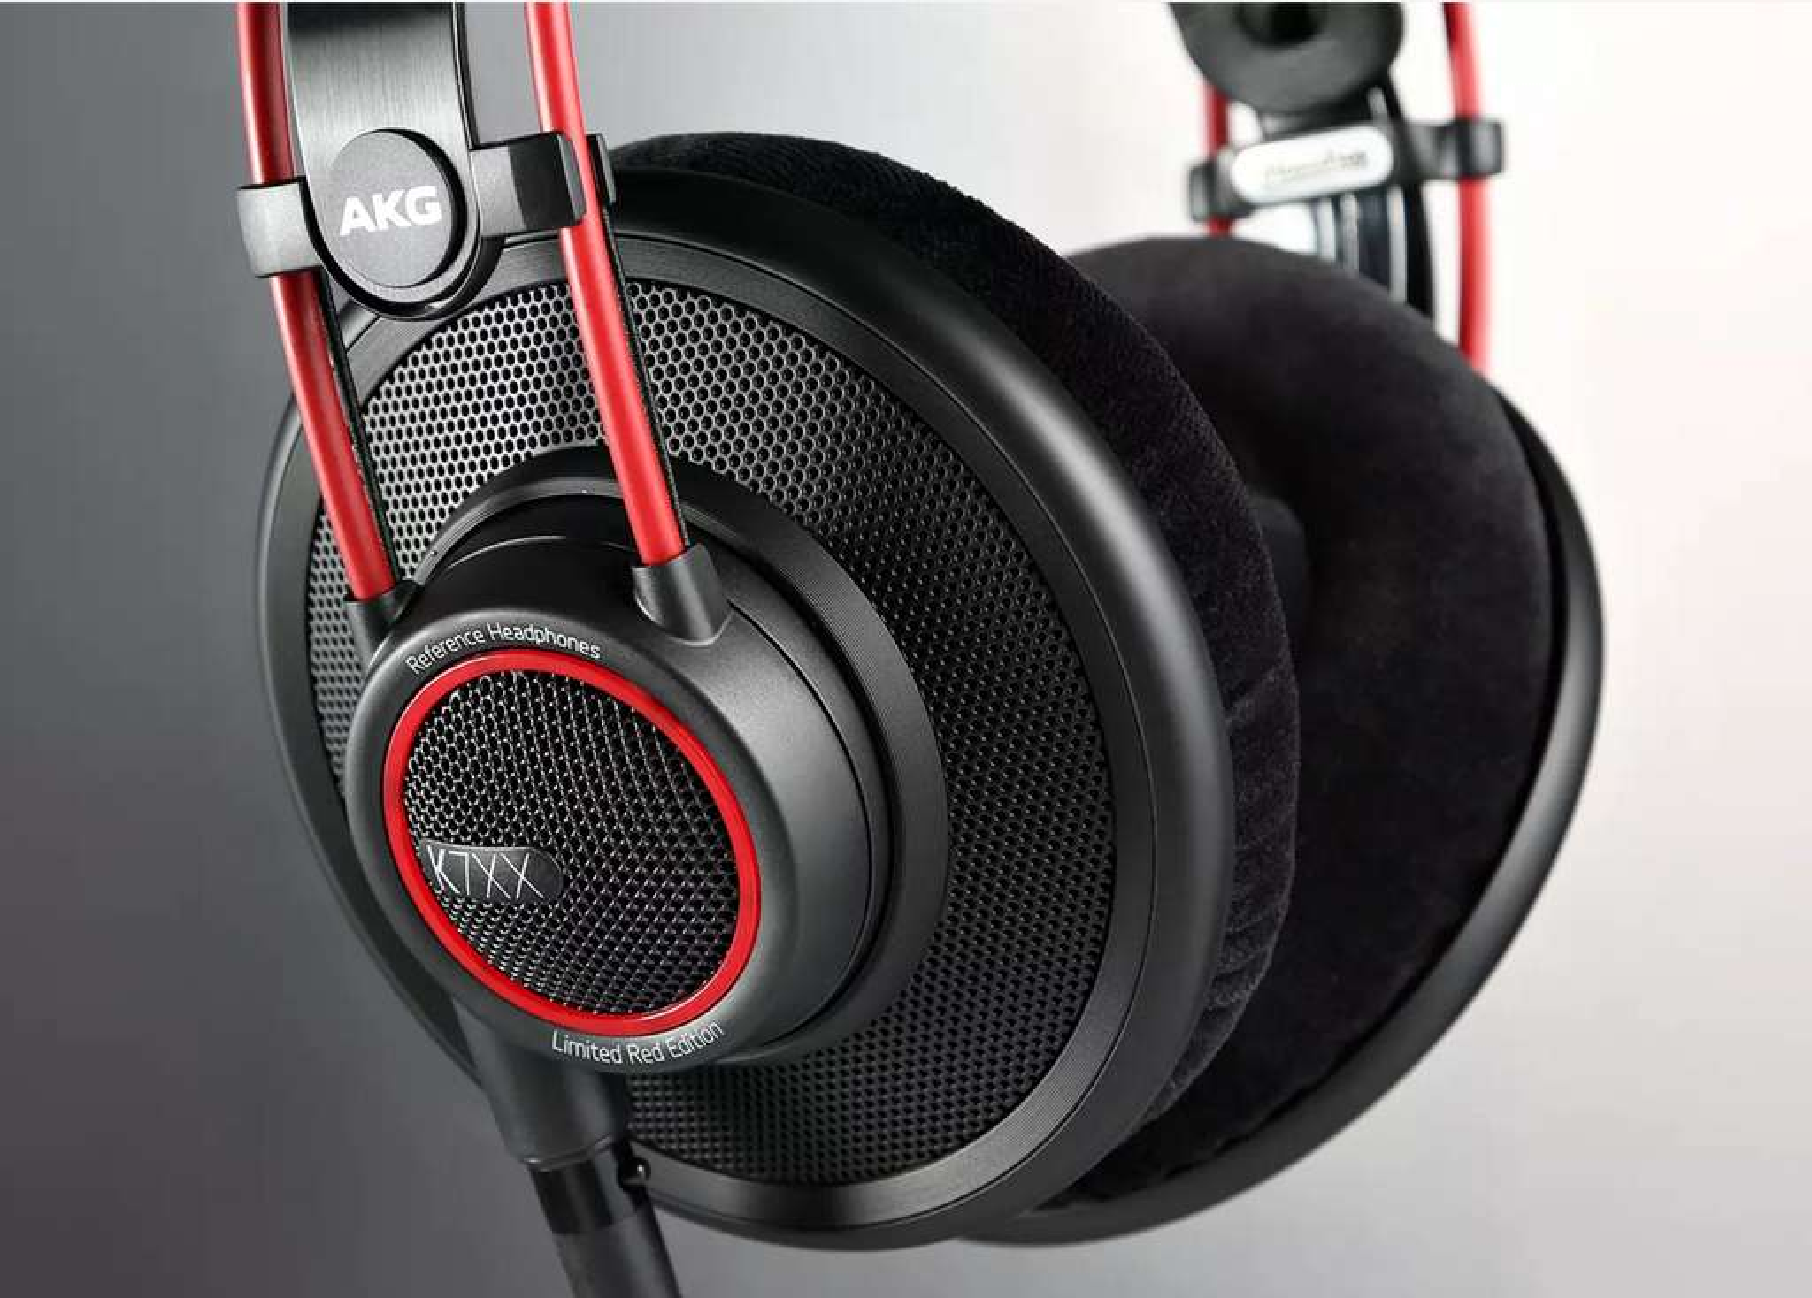 massdrop akg k7xx limited red edition offene over ear. Black Bedroom Furniture Sets. Home Design Ideas